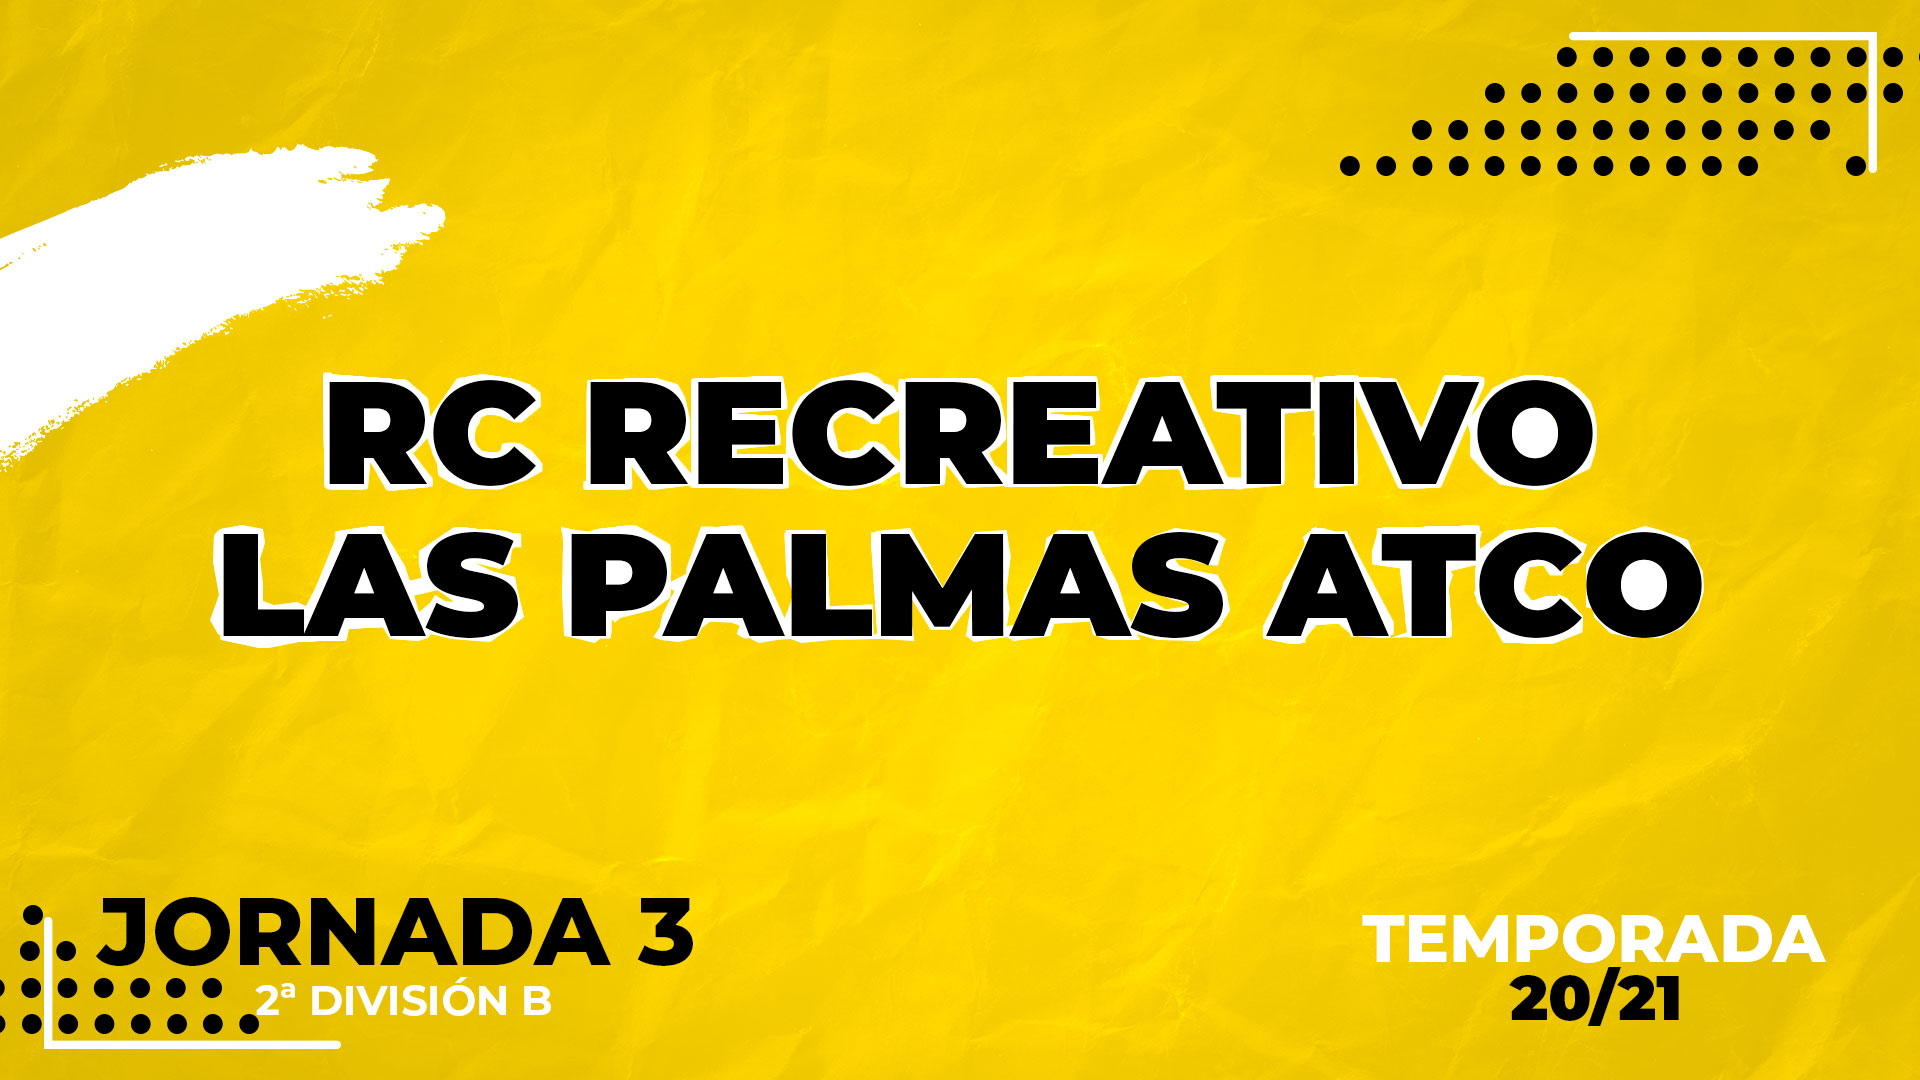 Recreativo vs Las Palmas Atlético